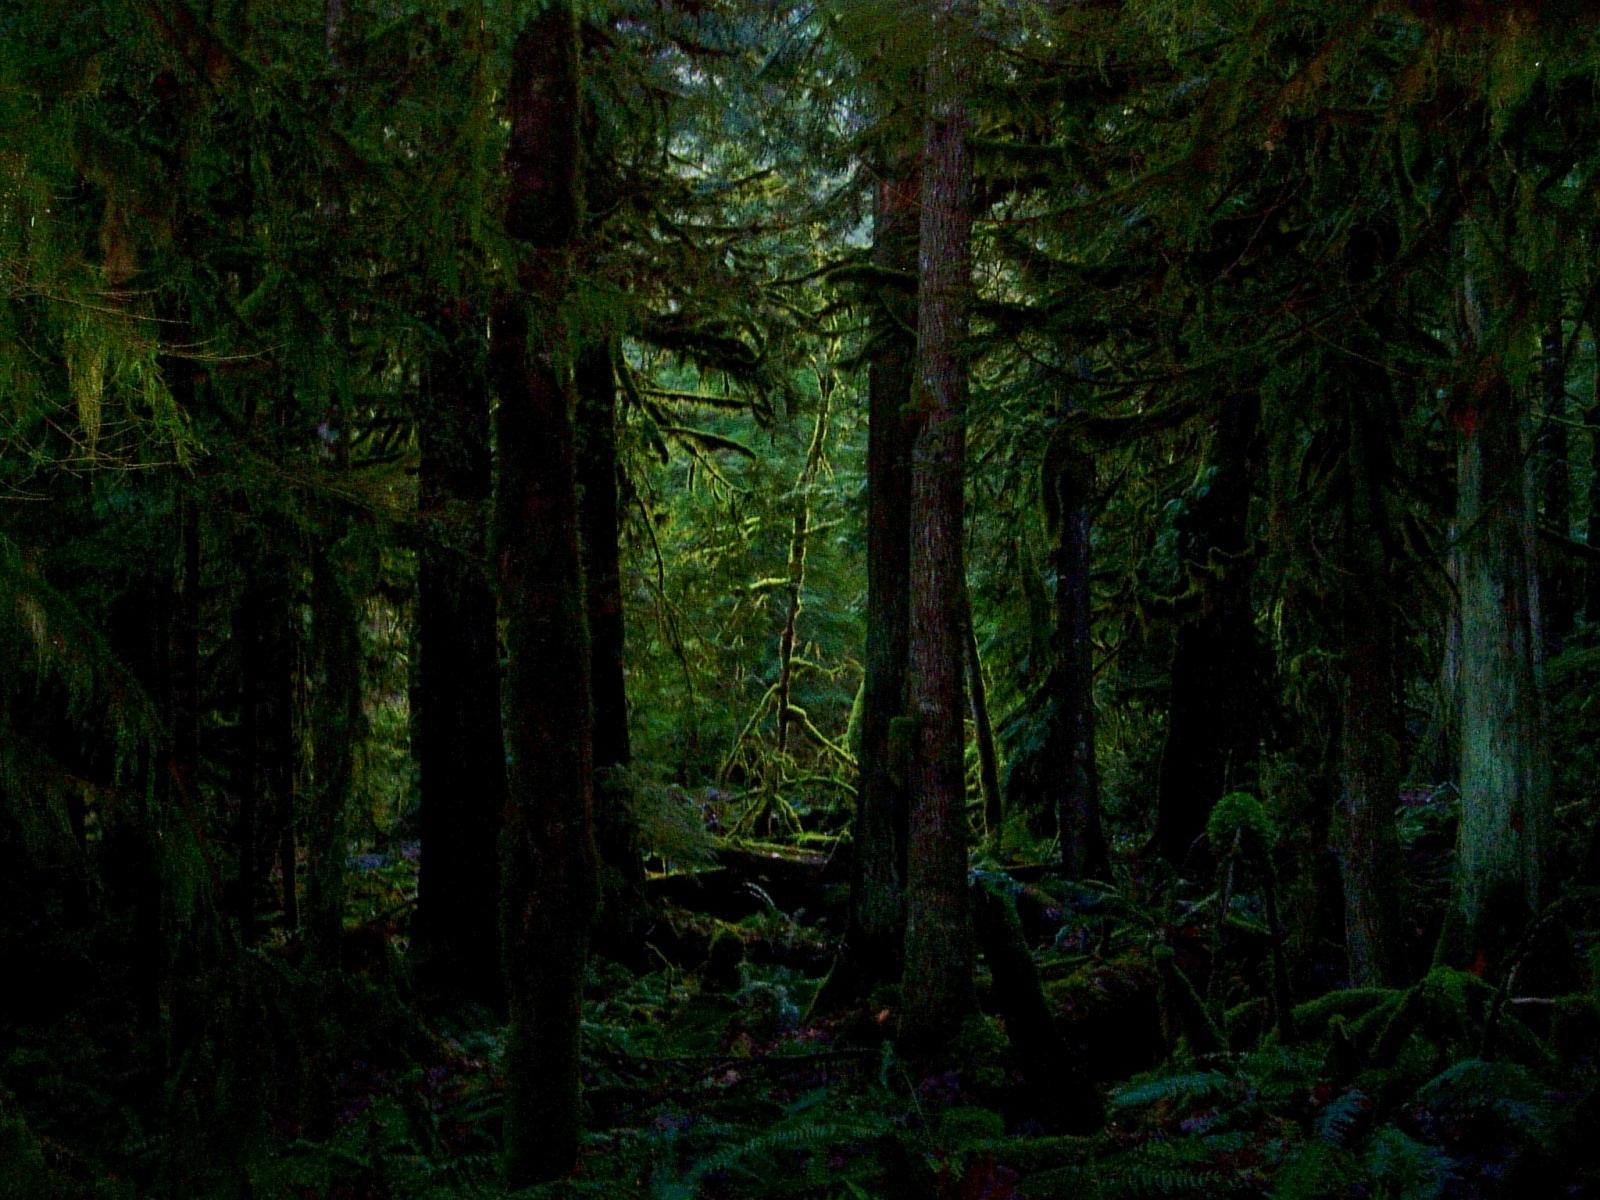 Pine Tree clipart forest wallpaper Wallpapers forest Dark com/dark com/dark